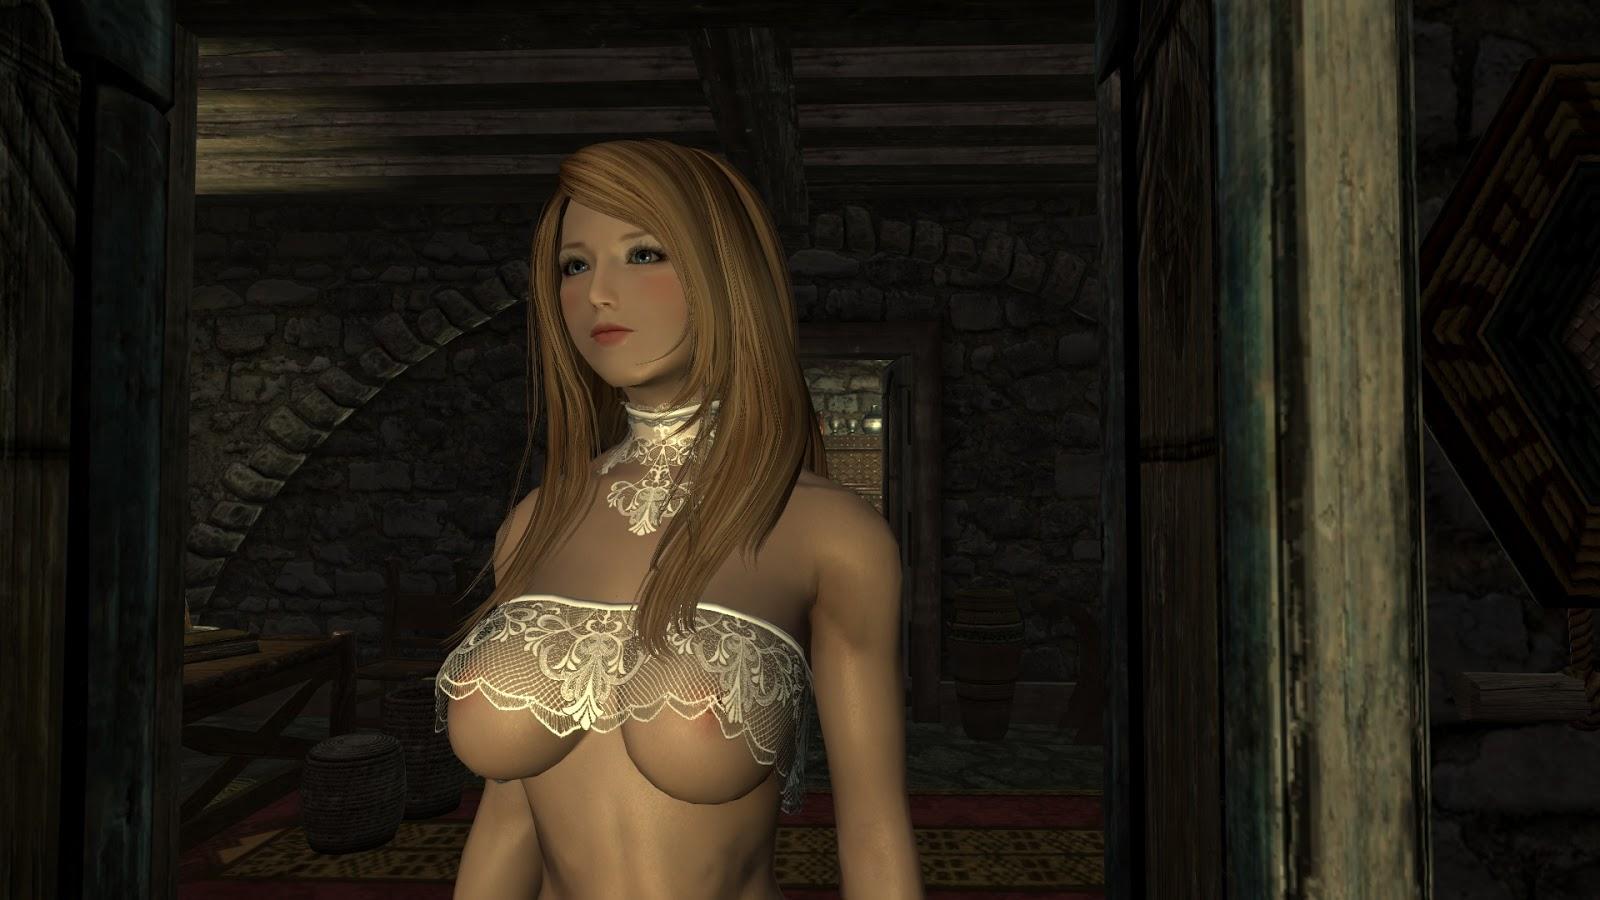 Skyrim sexlab defeat mod - 2 part 3